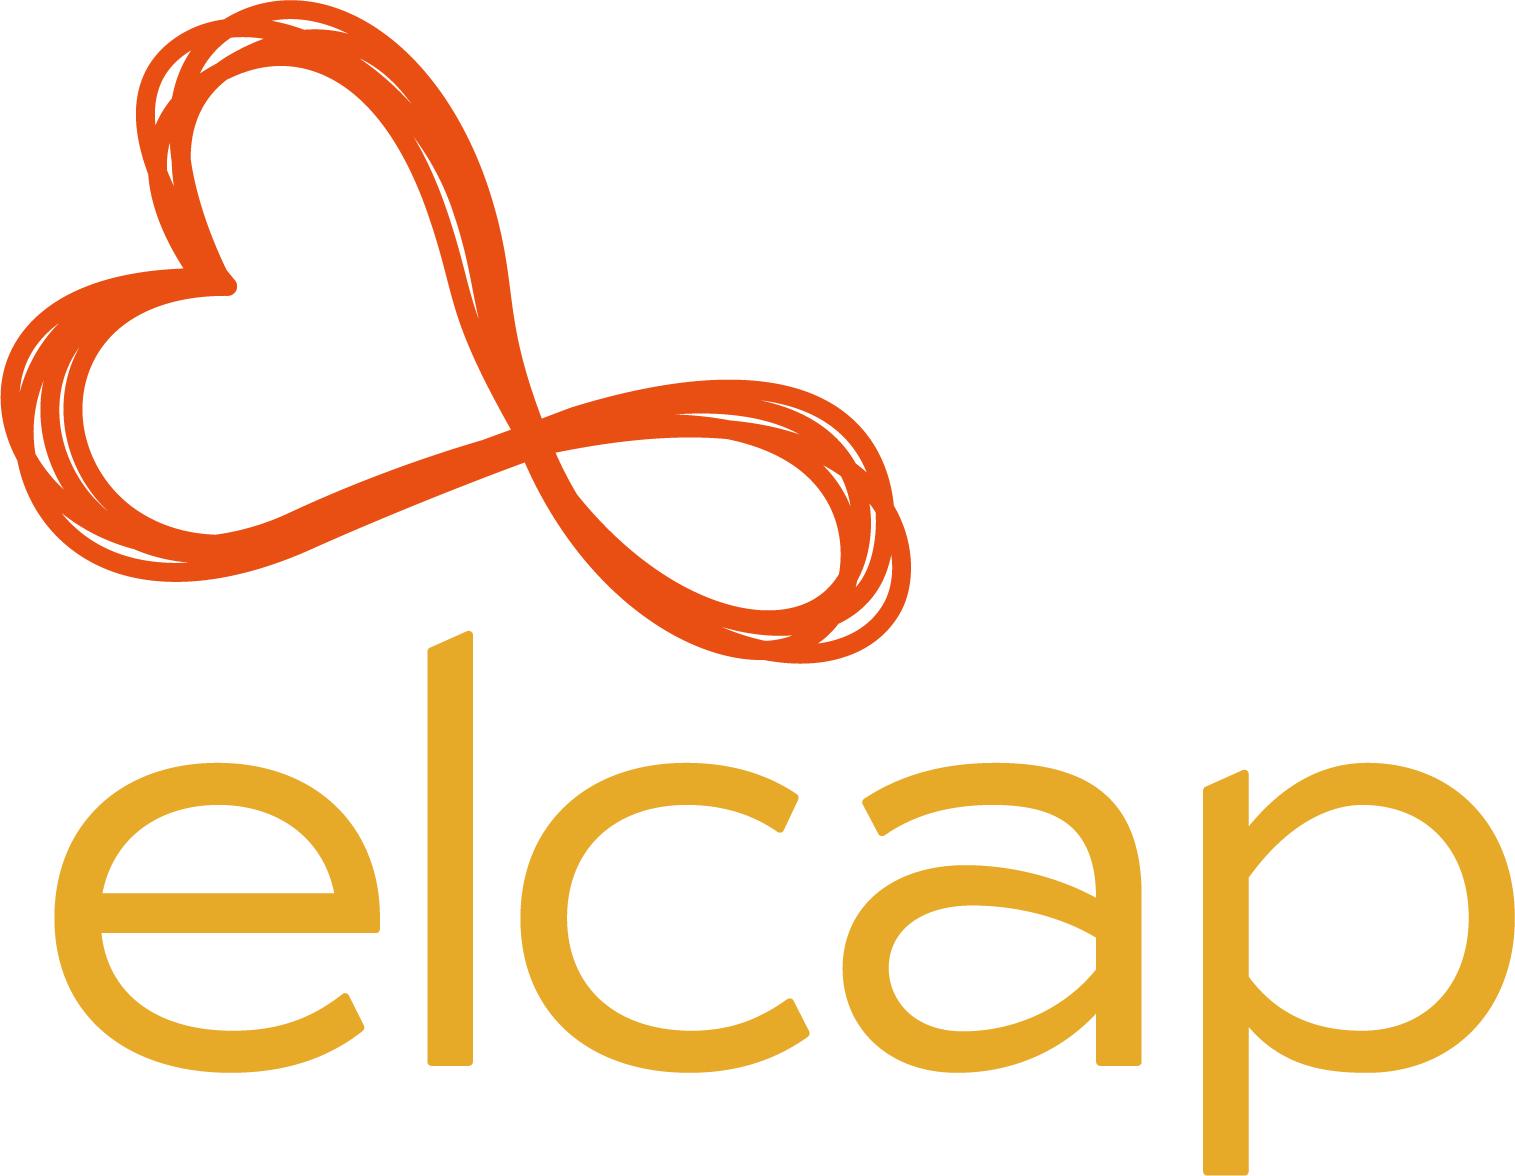 ELCAP launches new branding and website